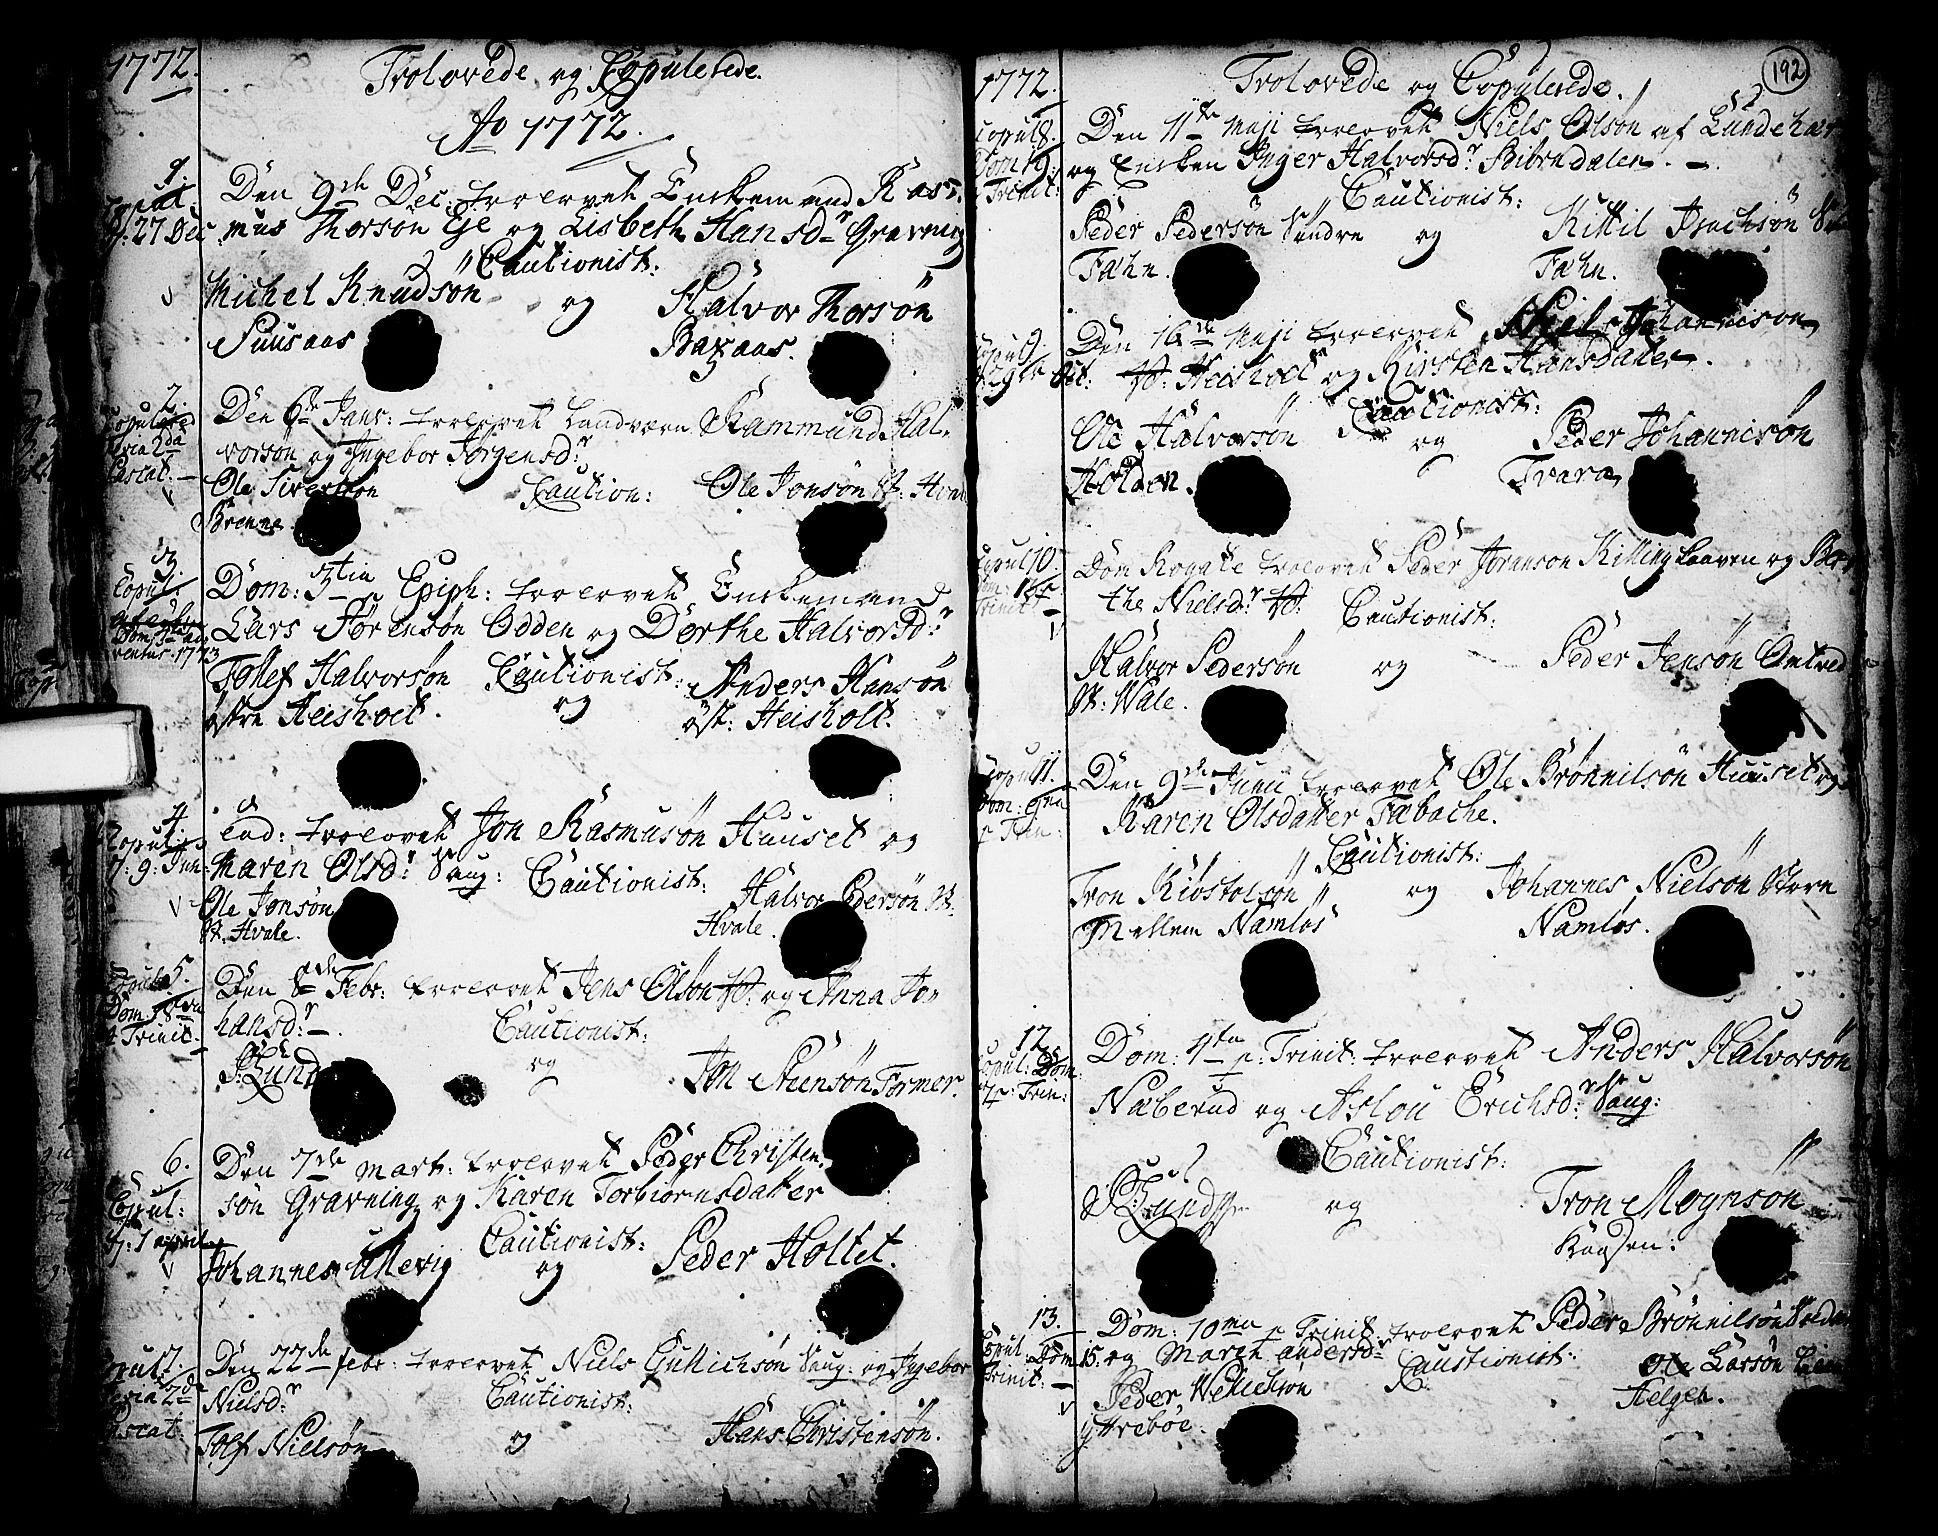 SAKO, Holla kirkebøker, F/Fa/L0001: Ministerialbok nr. 1, 1717-1779, s. 192